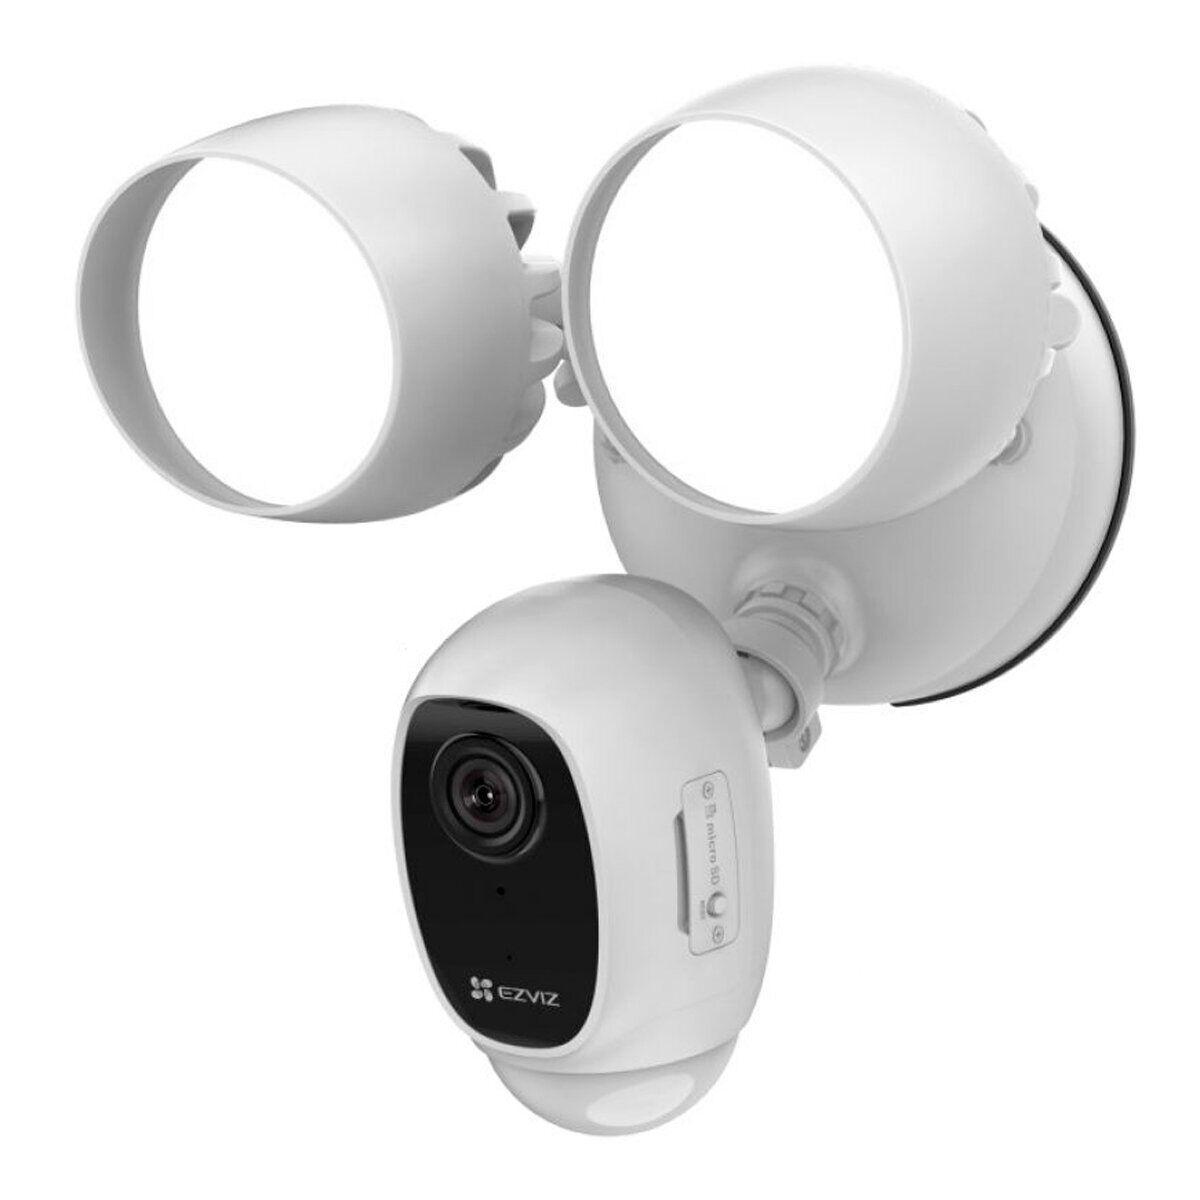 2МП Wi-Fi камера EZVIZ с освещением и сиреной CS-LC1C-A0-1F2WPFRL (2.8mm)